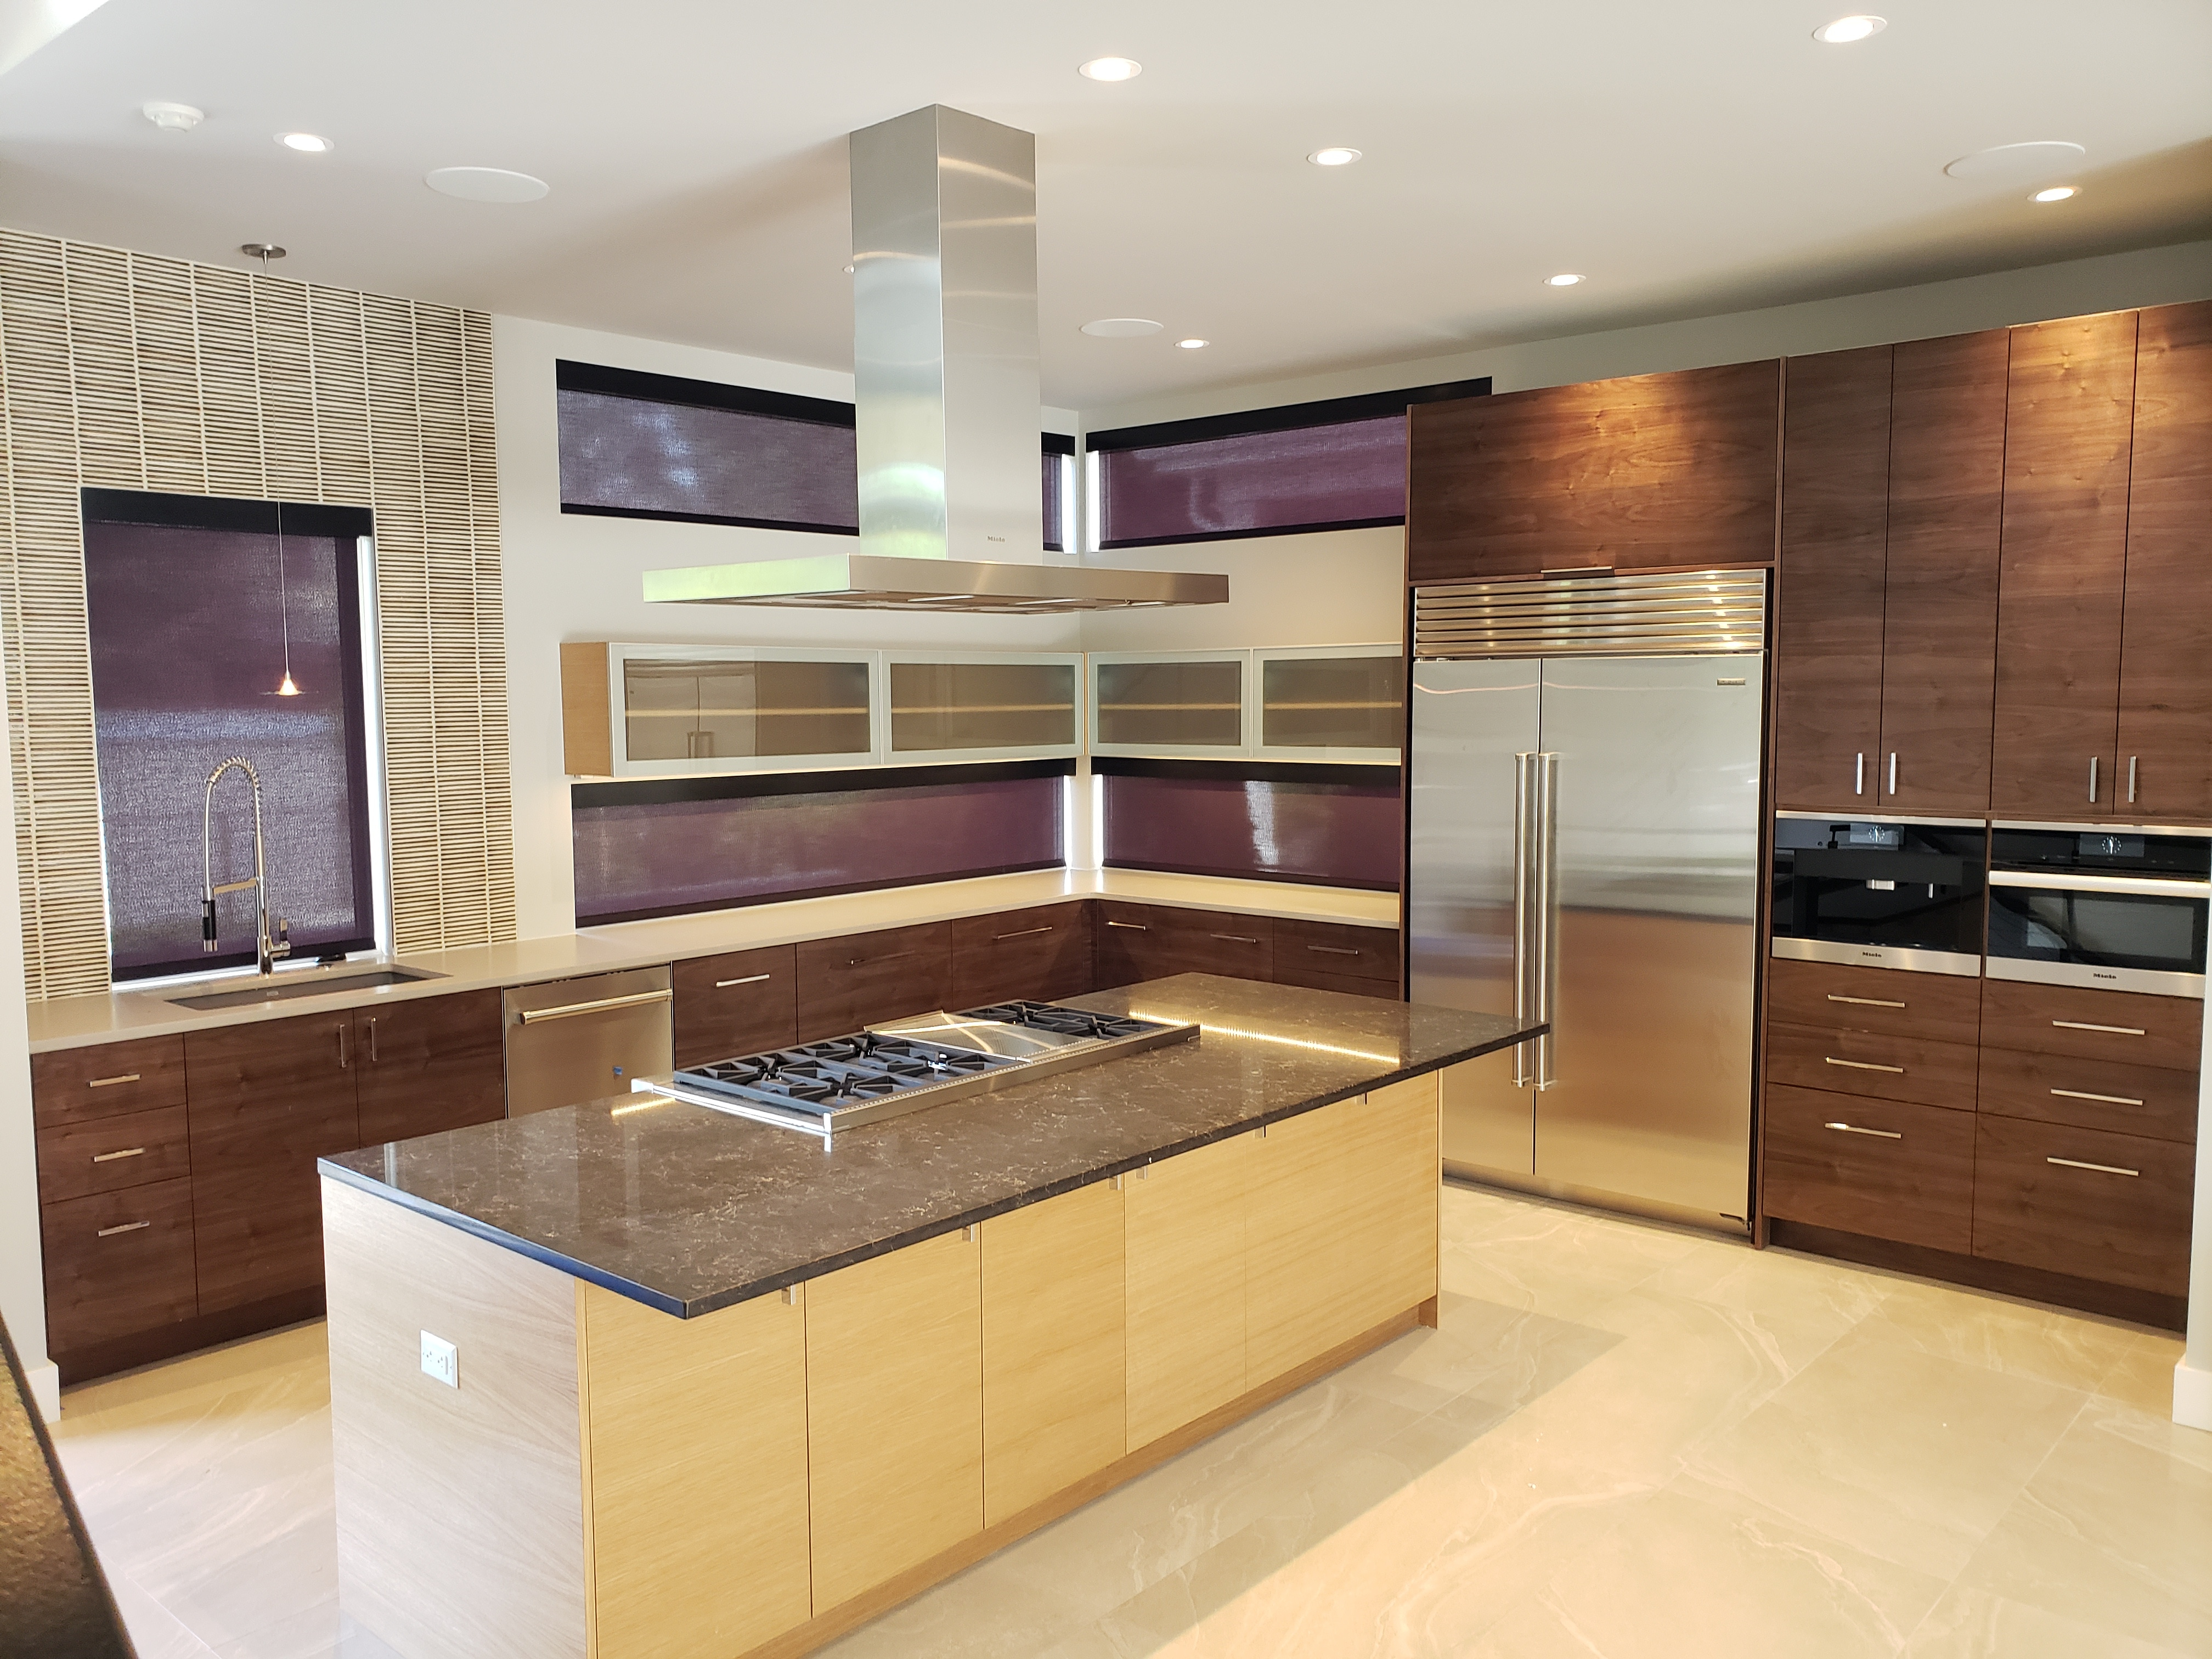 Gaylord kitchen